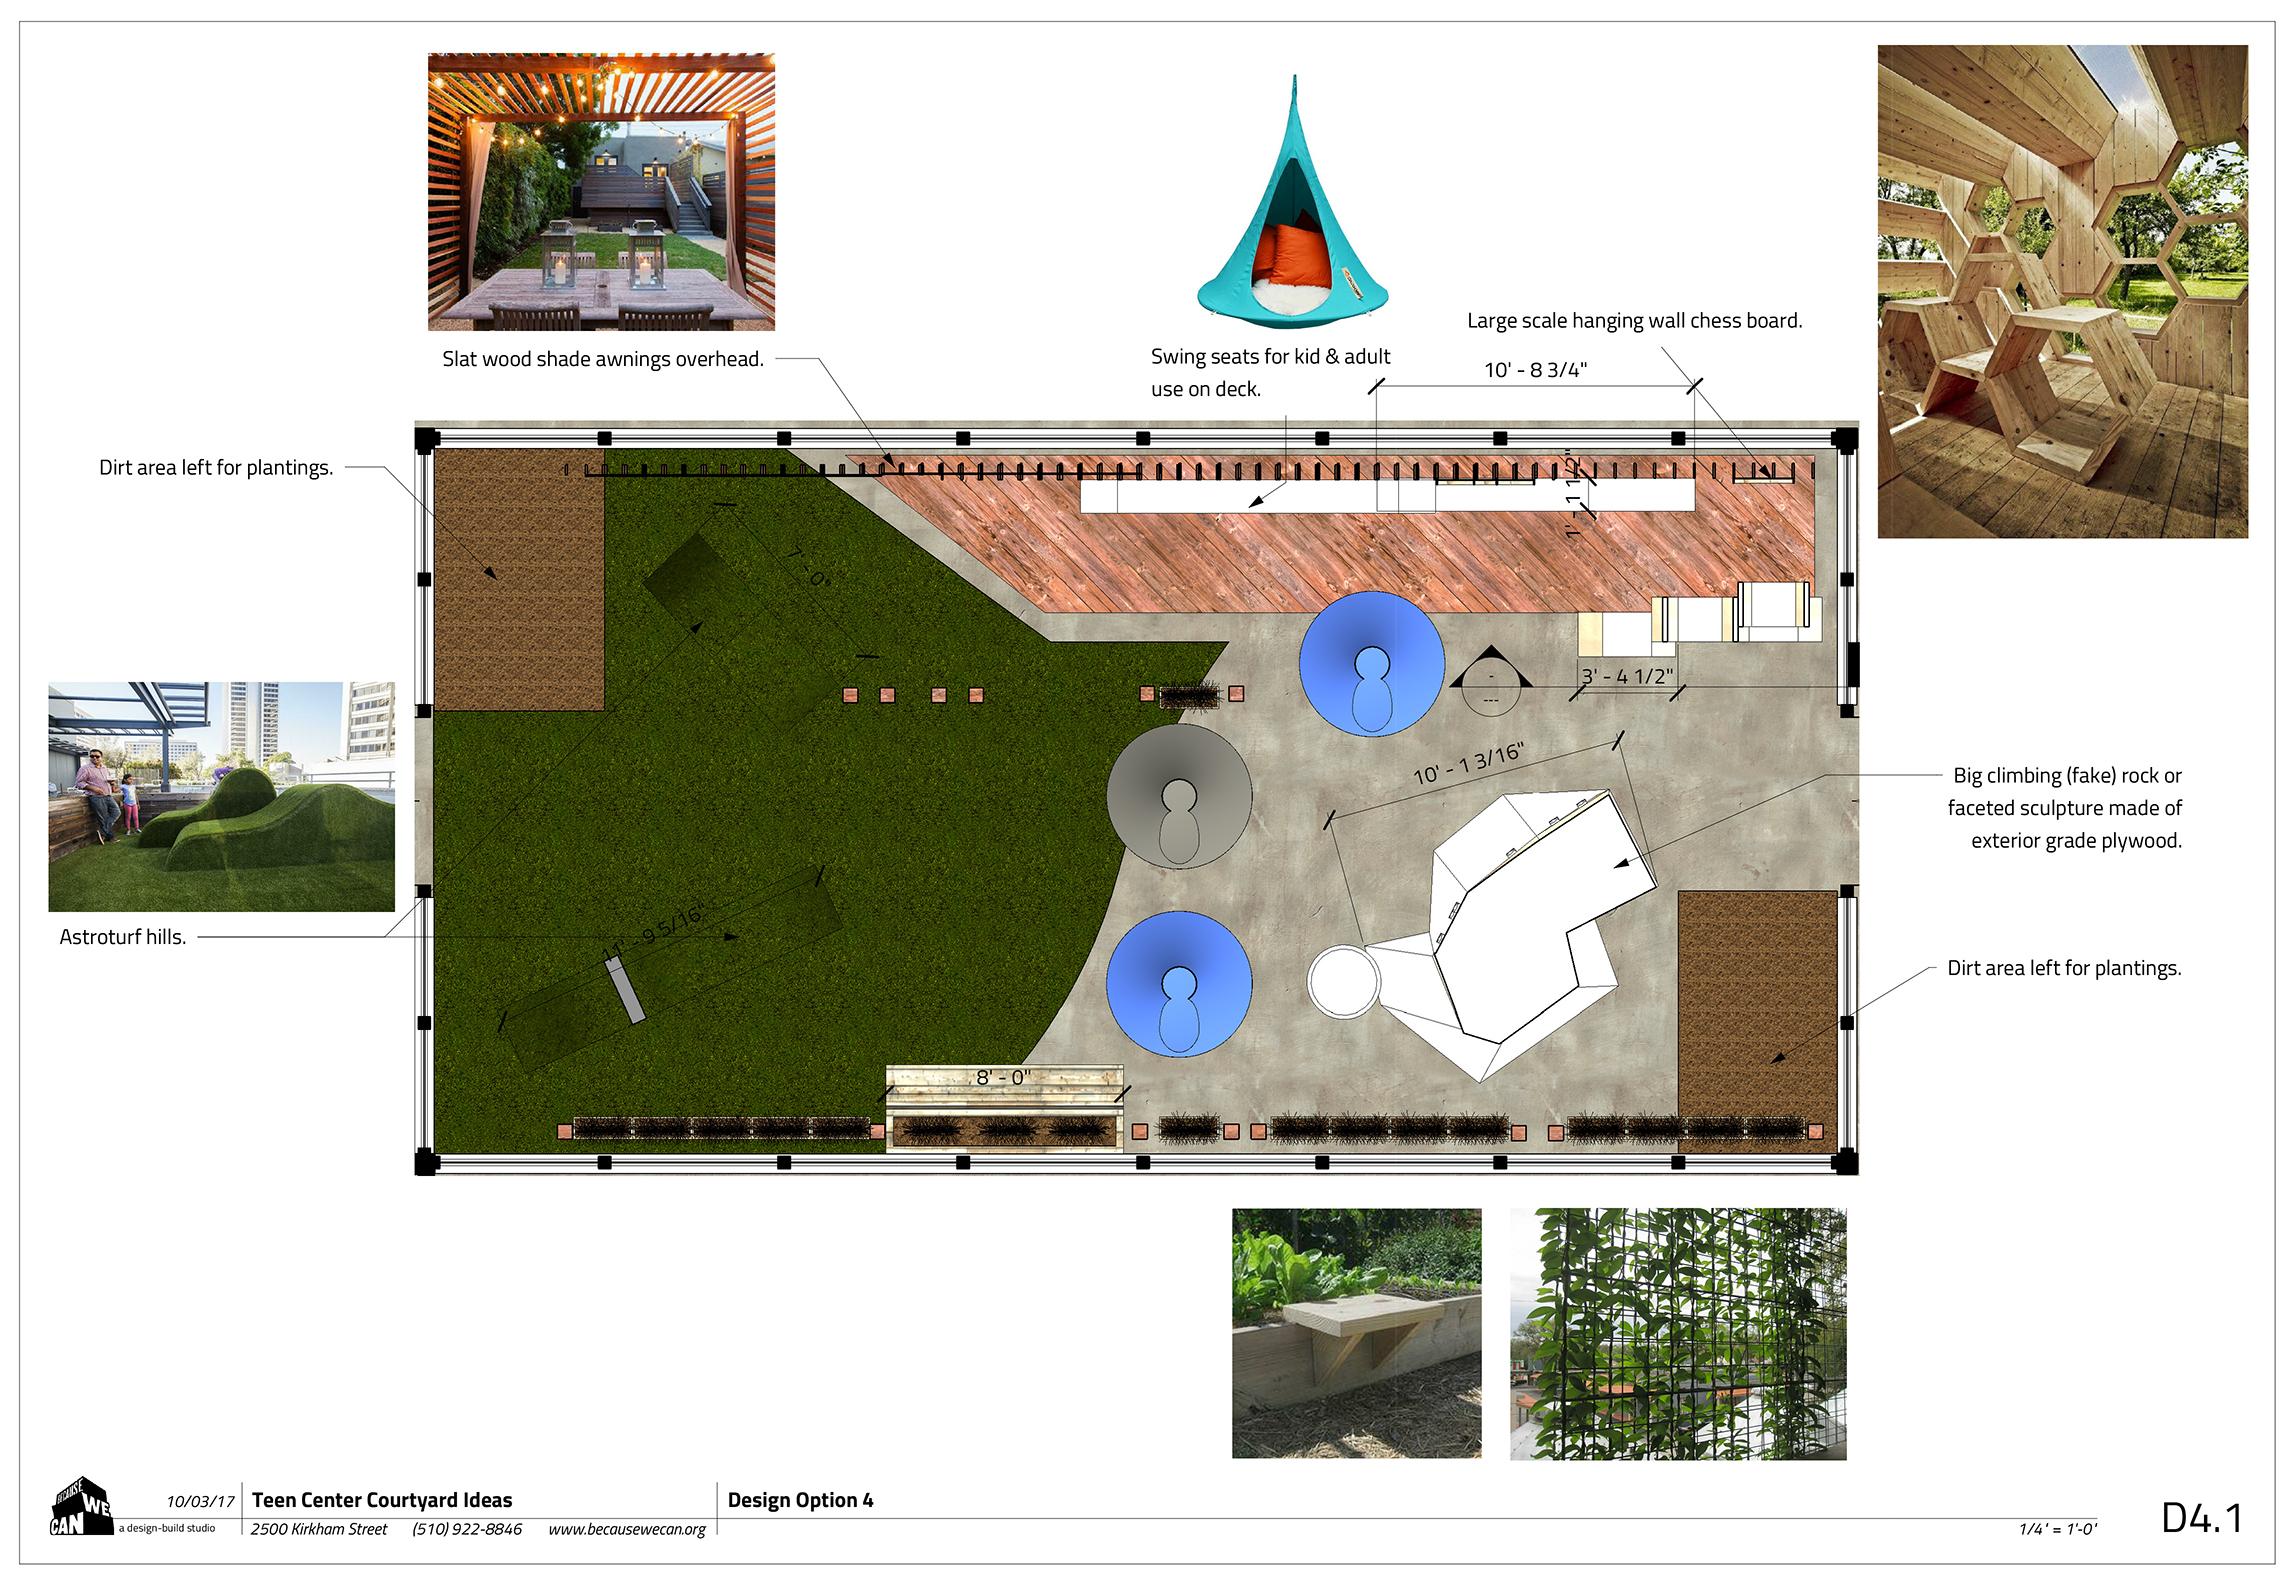 100317_CourtyardDesignsV3-1.jpg